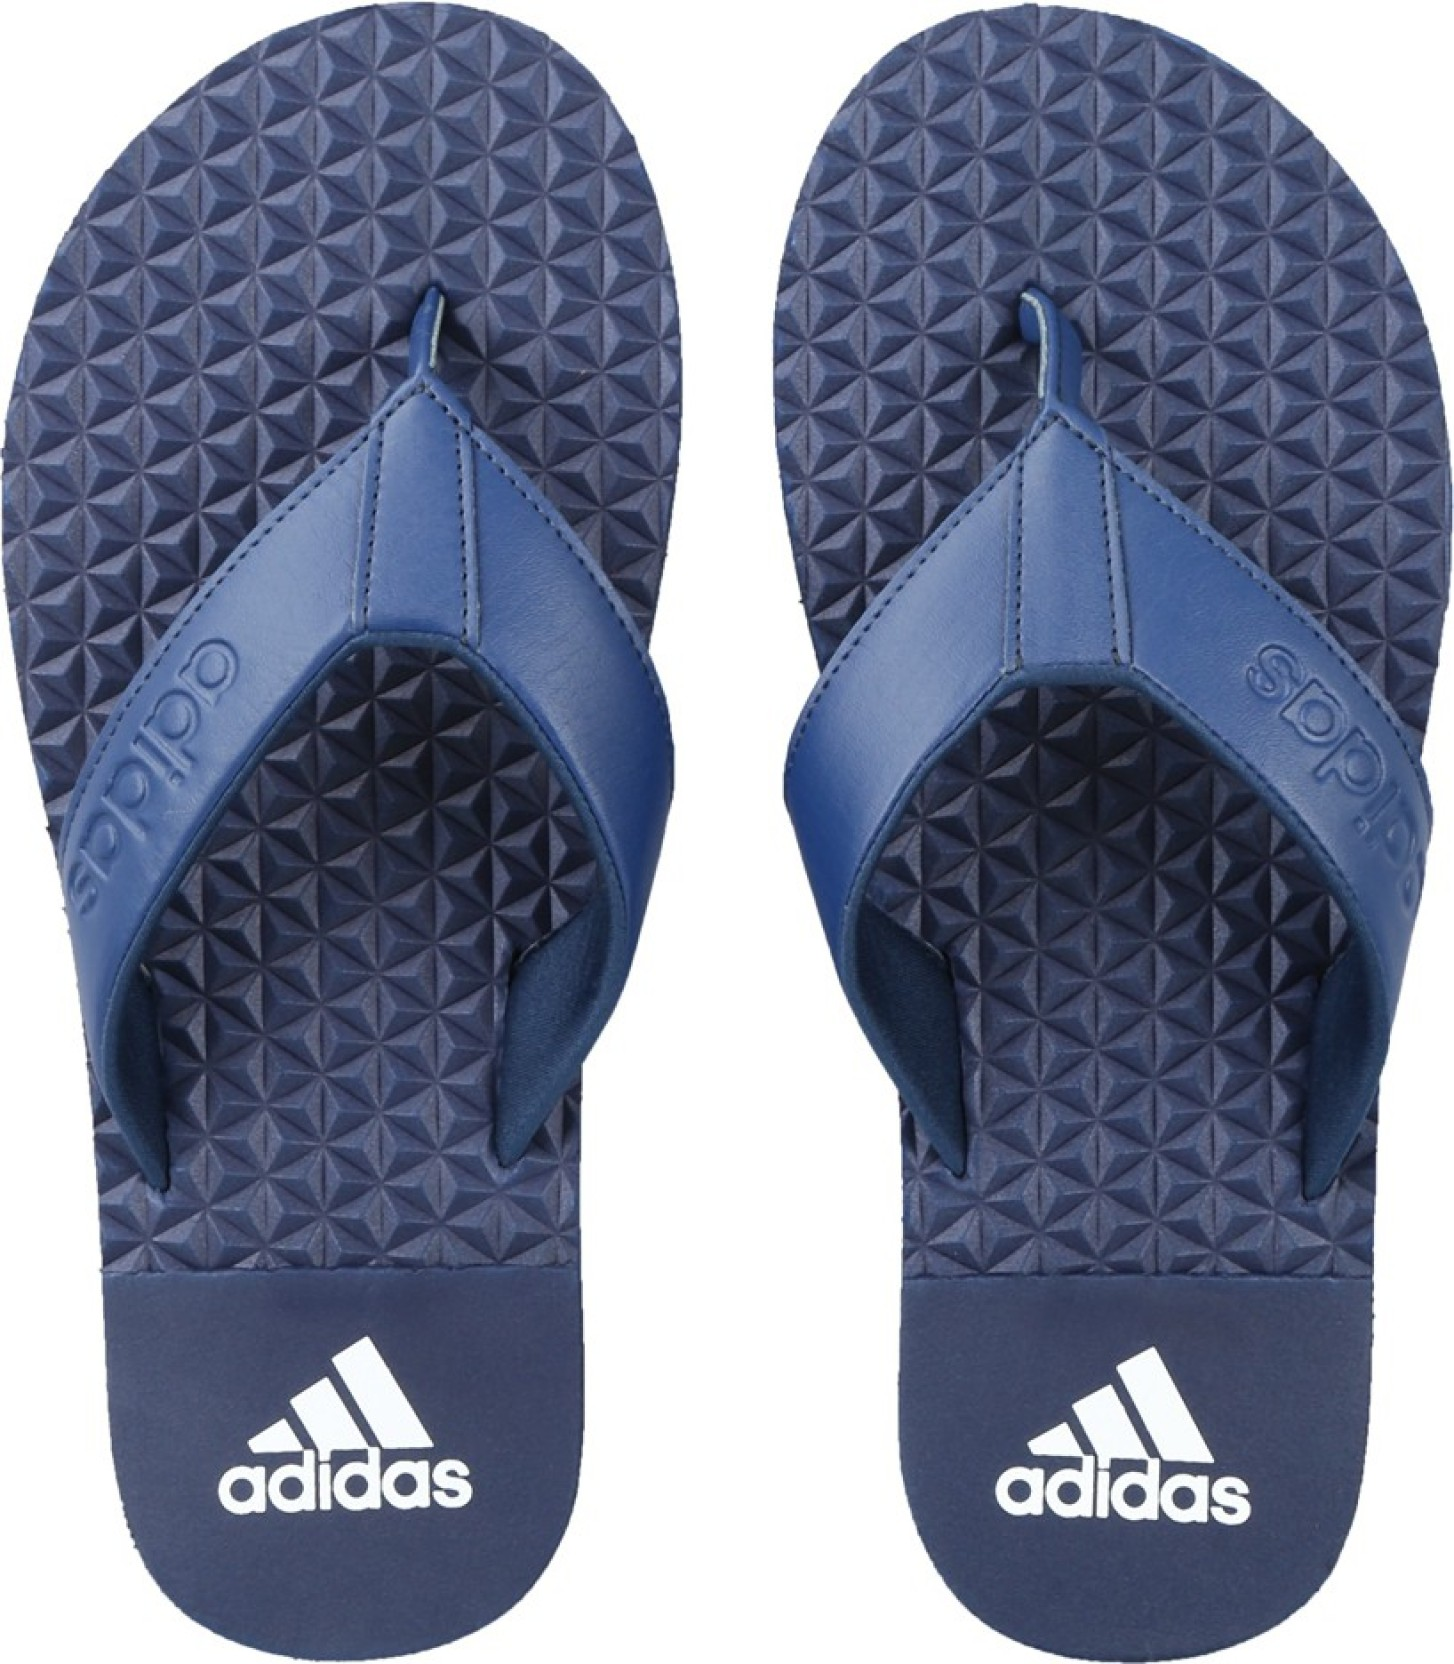 bfbb899d5cd0 ADIDAS JIB Slippers - Buy MYSBLU FTWWHT Color ADIDAS JIB Slippers ...